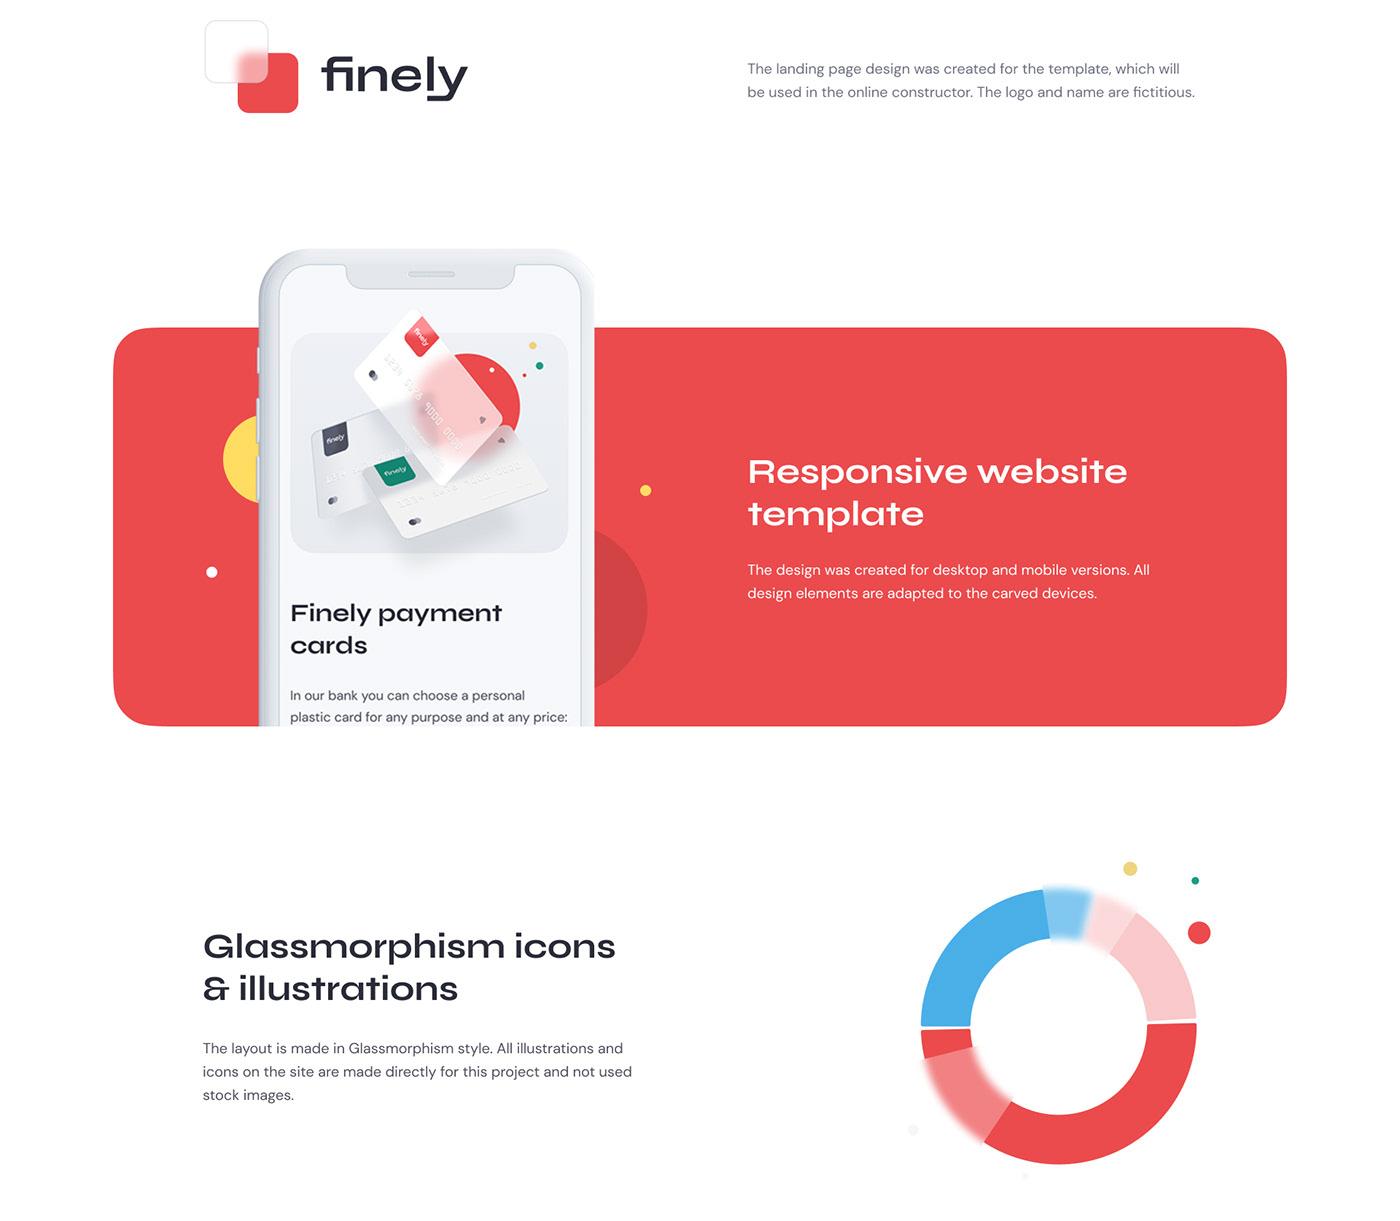 Bank banking cards finance Fintech glassmorphism template Web